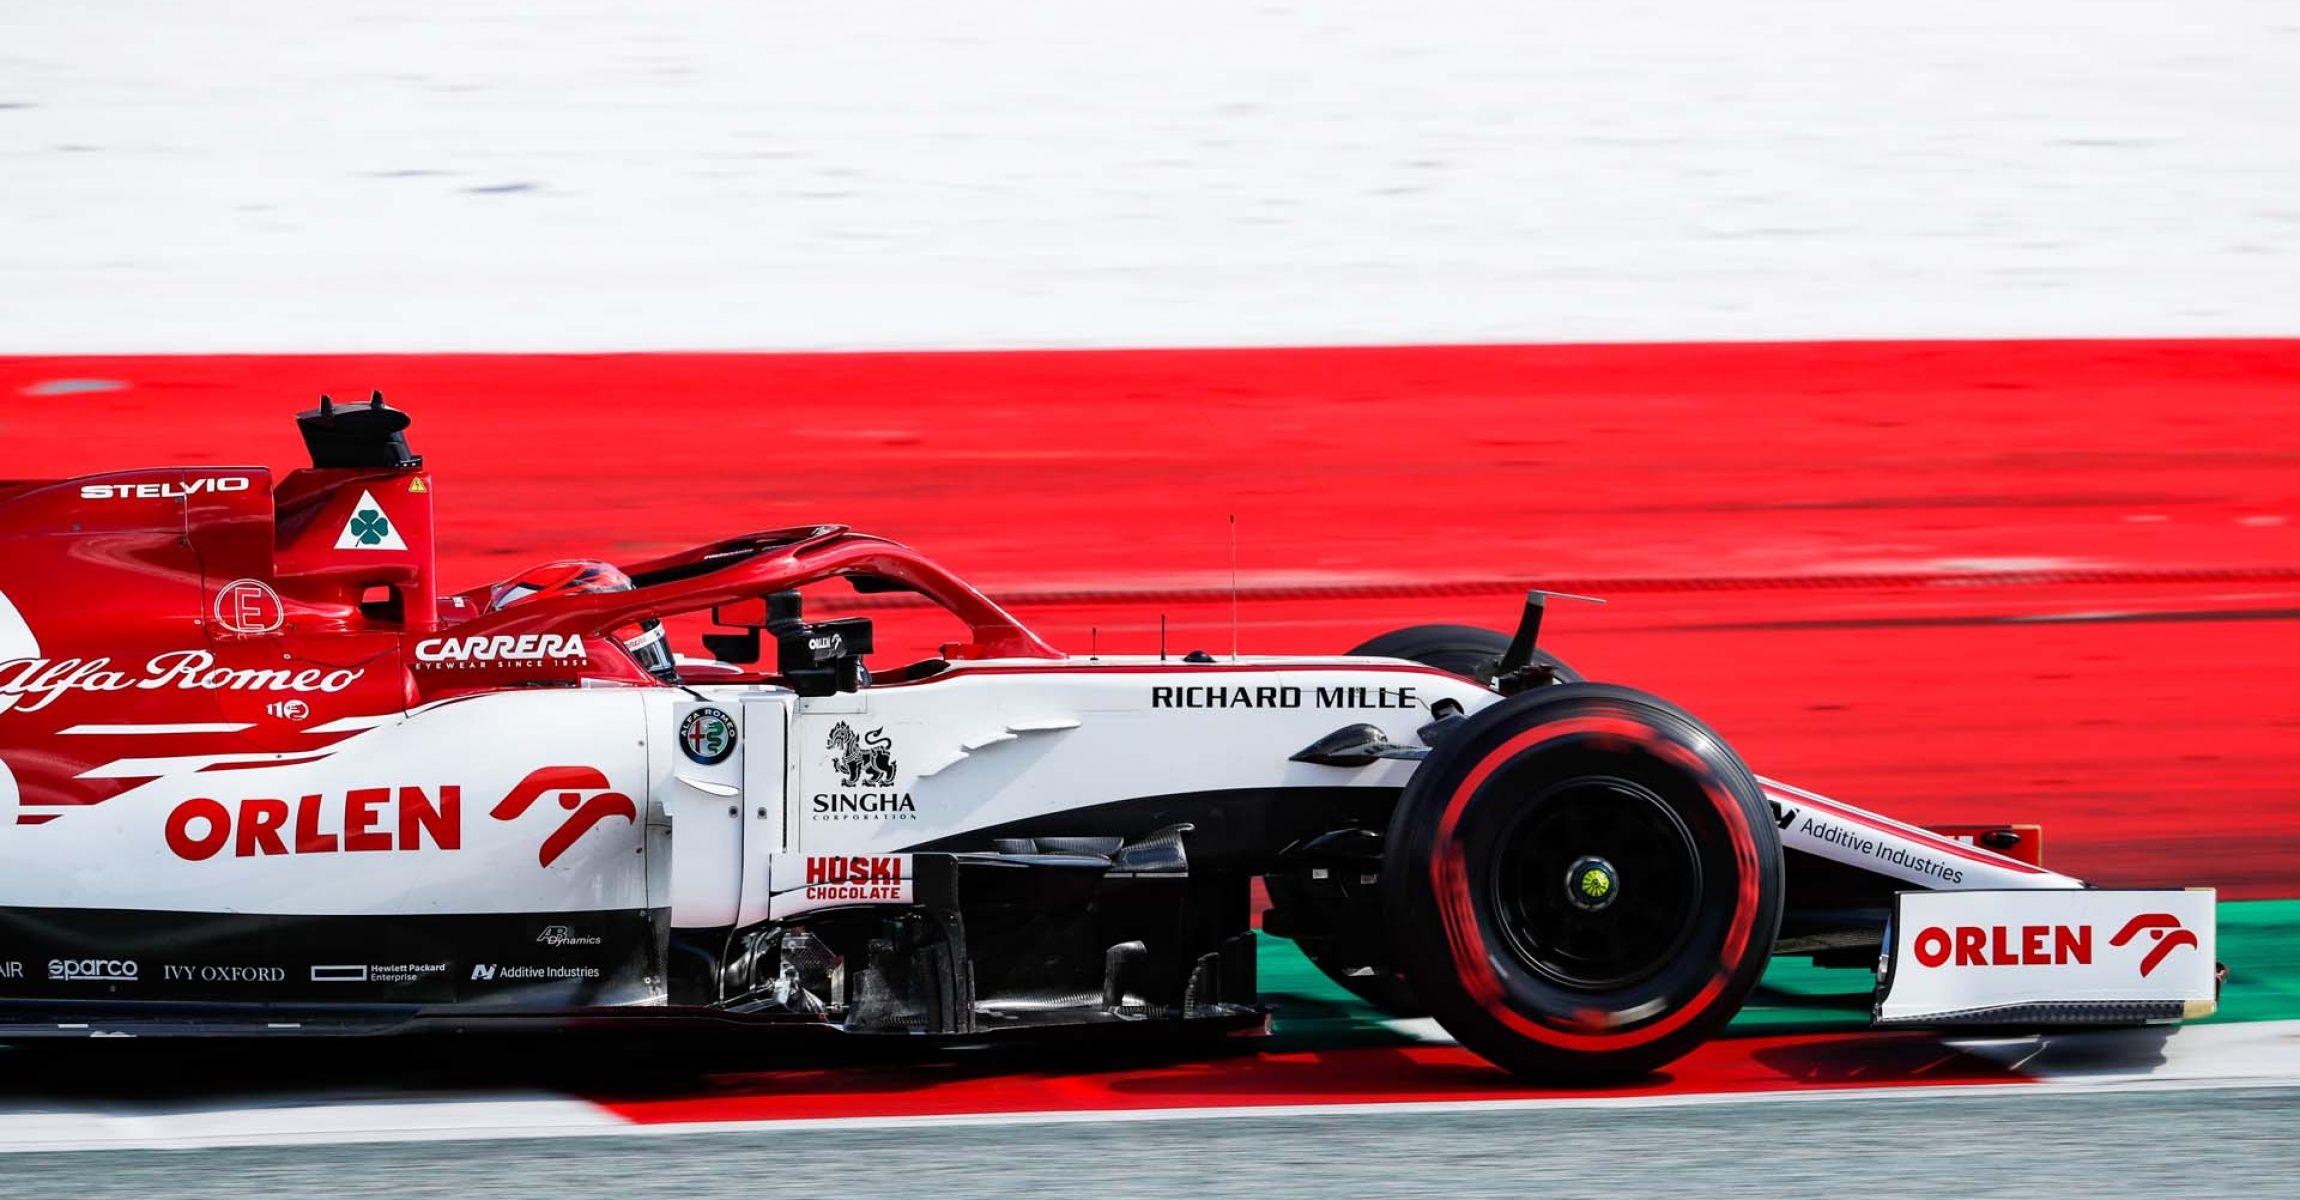 07 RAIKKONEN Kimi Räikkönen (fin), Alfa Romeo Racing C39, action during the Formula 1 Pirelli Grosser Preis der Steiermark 2020, Styrian Grand Prix from July 10 to 12, 2020 on the Red Bull Ring, in Spielberg, Austria - Photo Antonin Vincent / DPPI